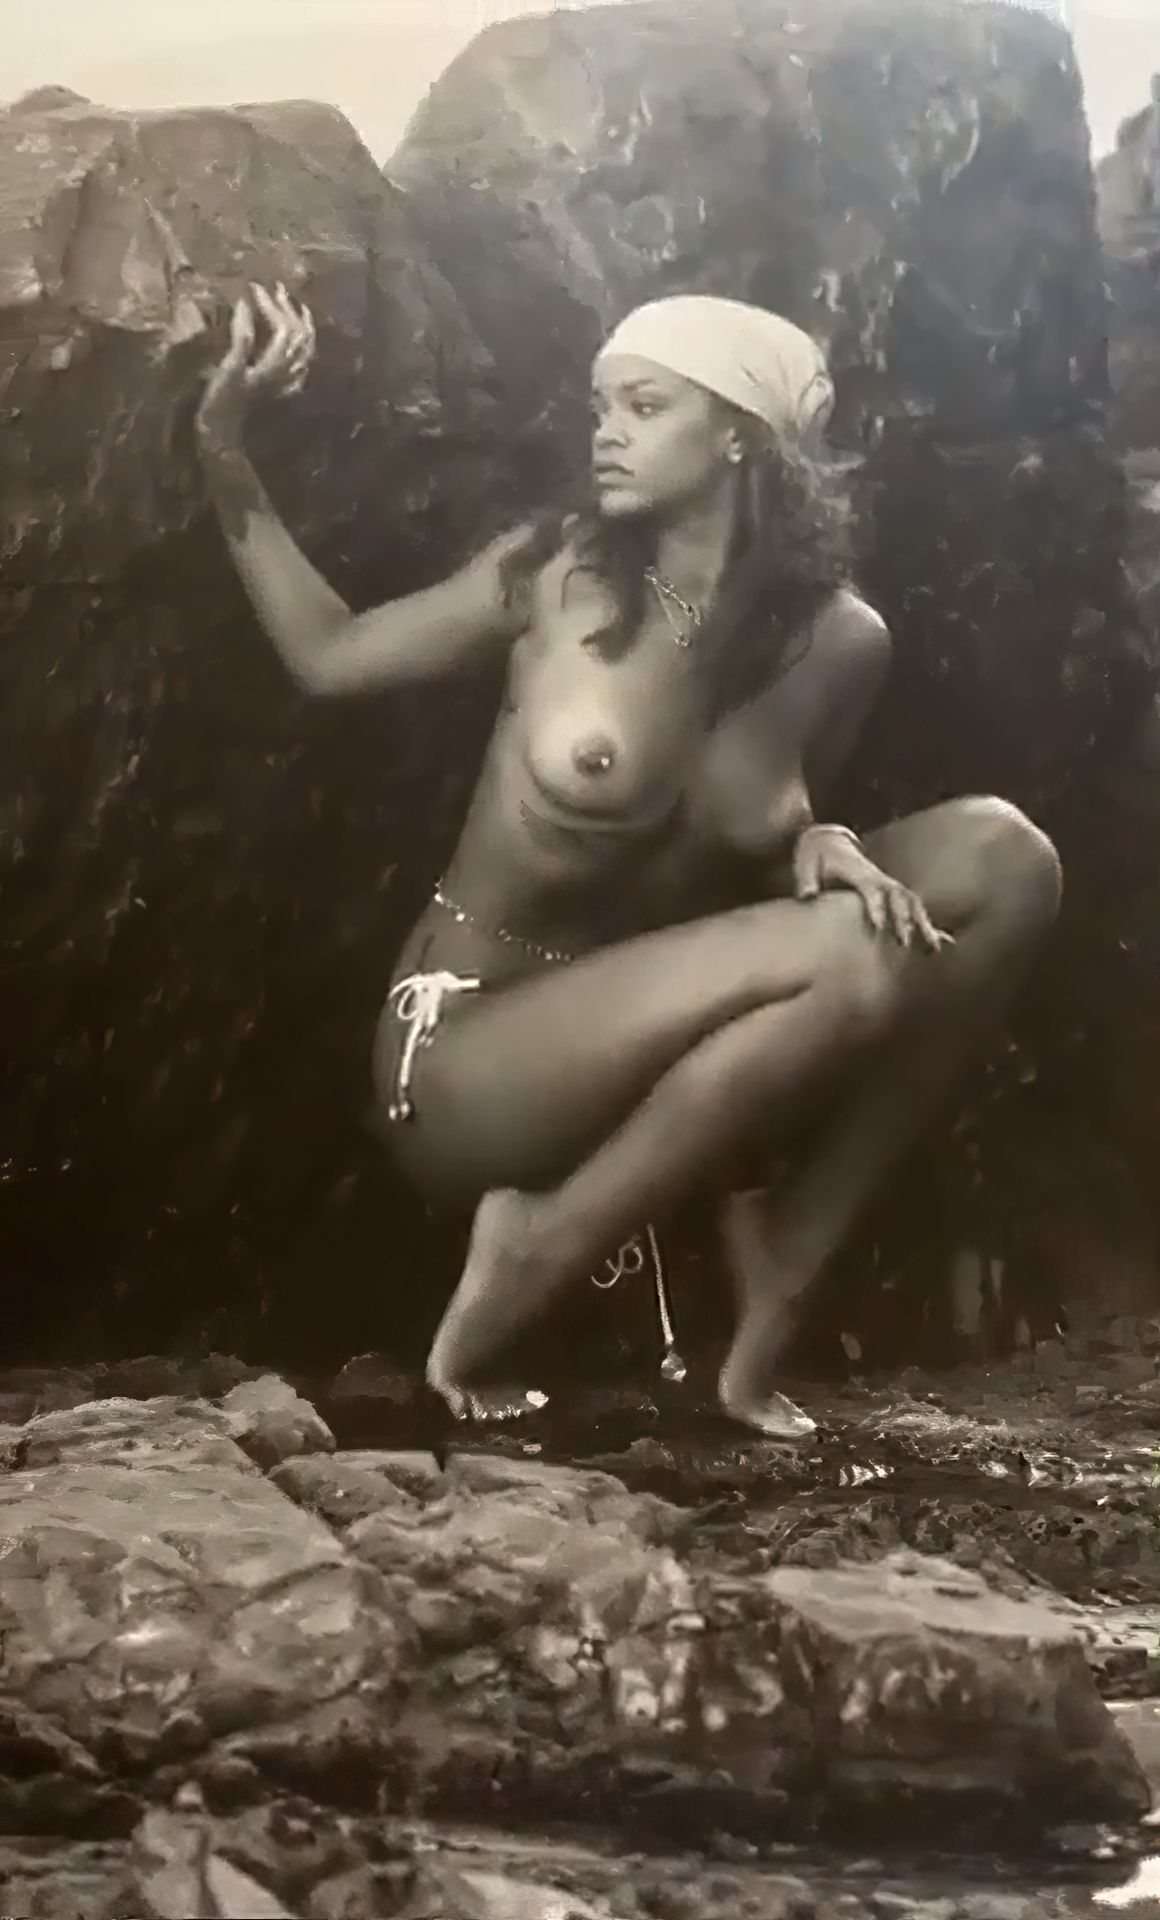 Rihanna-Nude-TheFappeningBlog.com-1.jpg